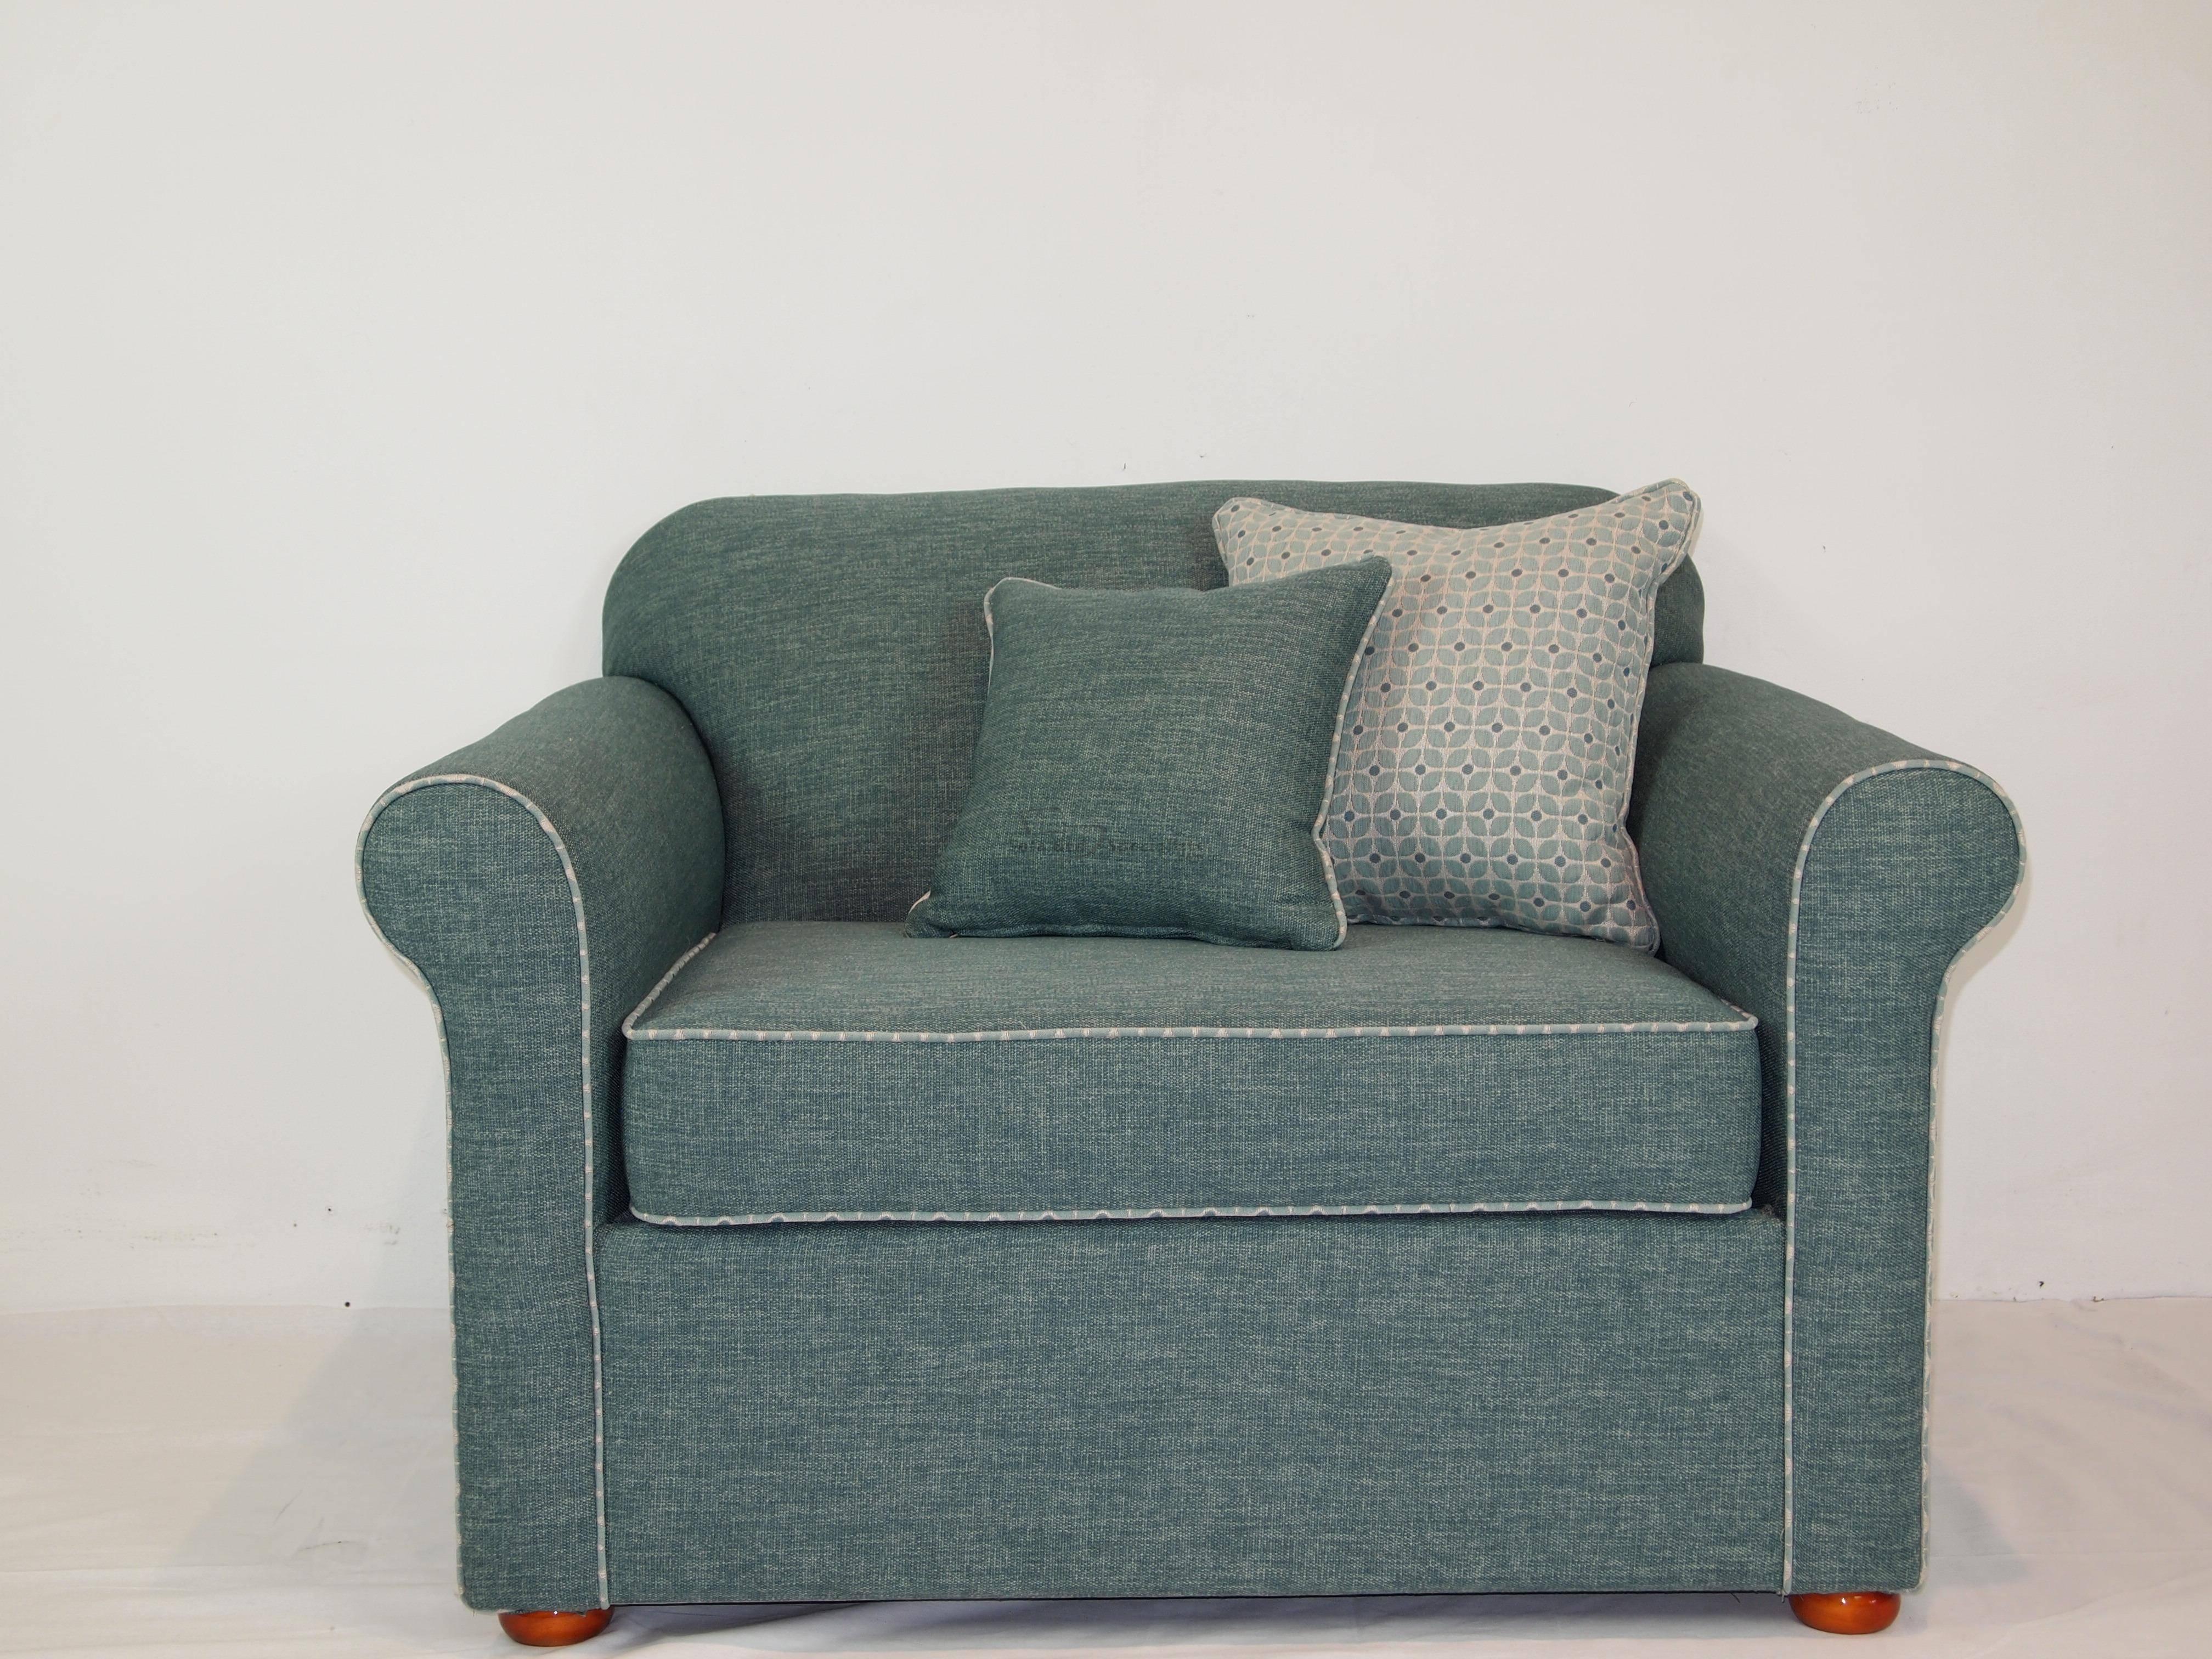 Futon Single Chair Bed Single Futon Sofa Bed Premier fort